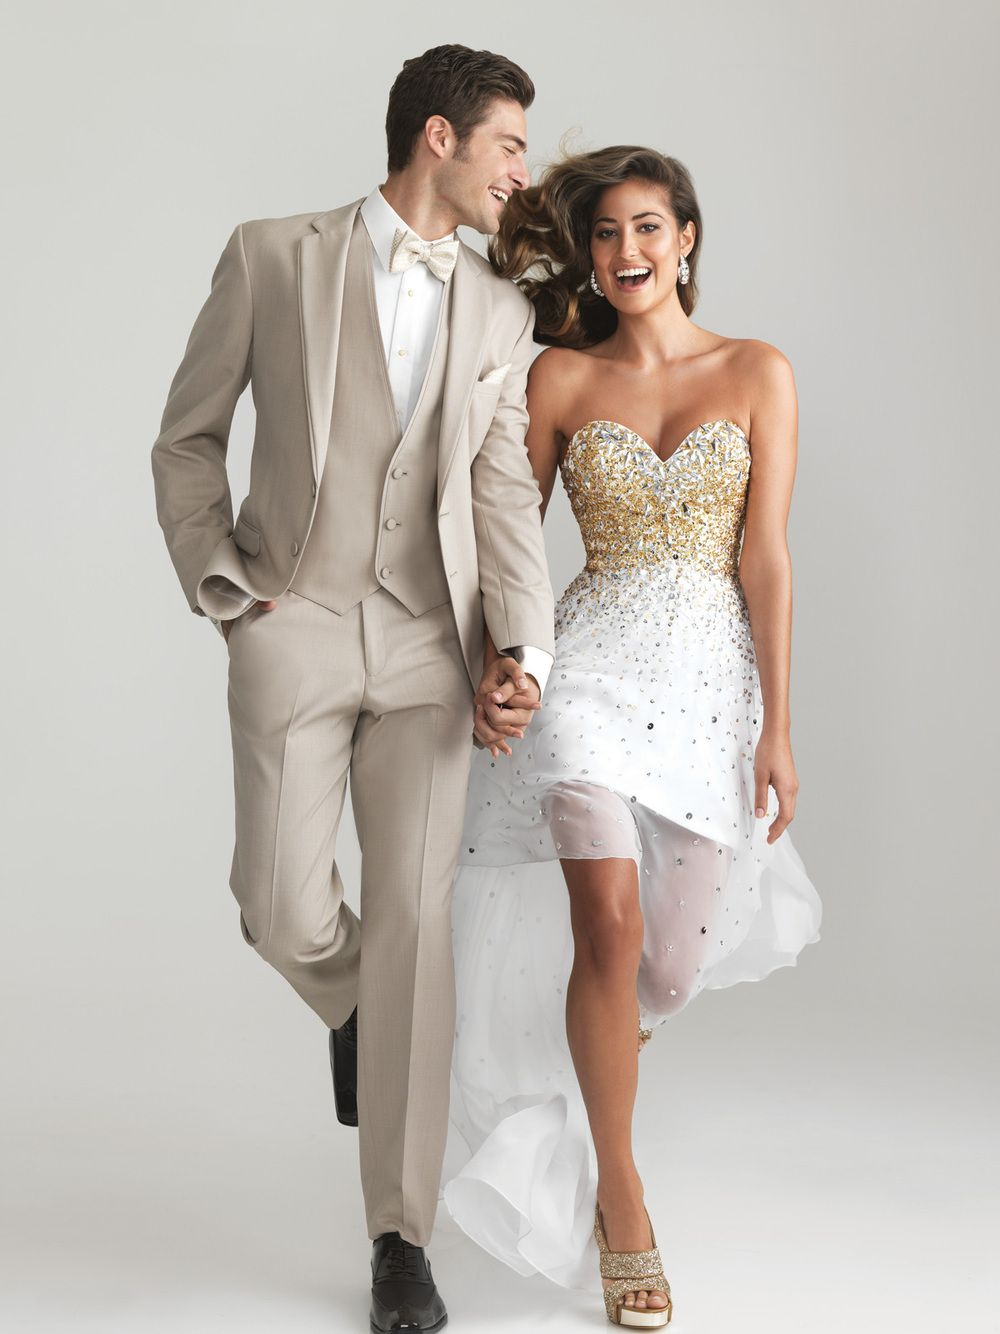 2015 springCustom made Champagne tuxedo groom wedding suit /groom ...